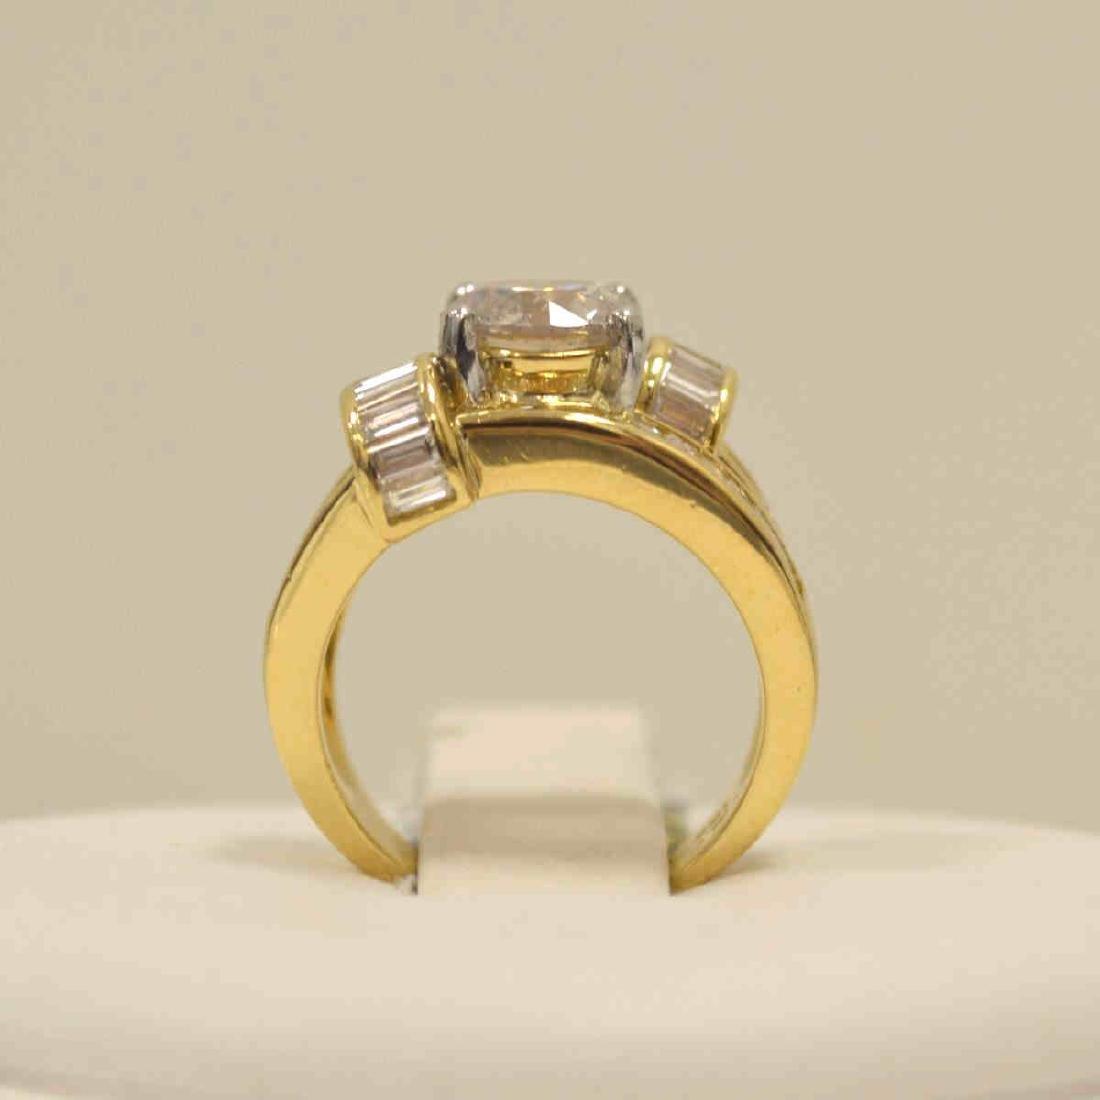 18kt yellow gold diamond fashion ring - 3